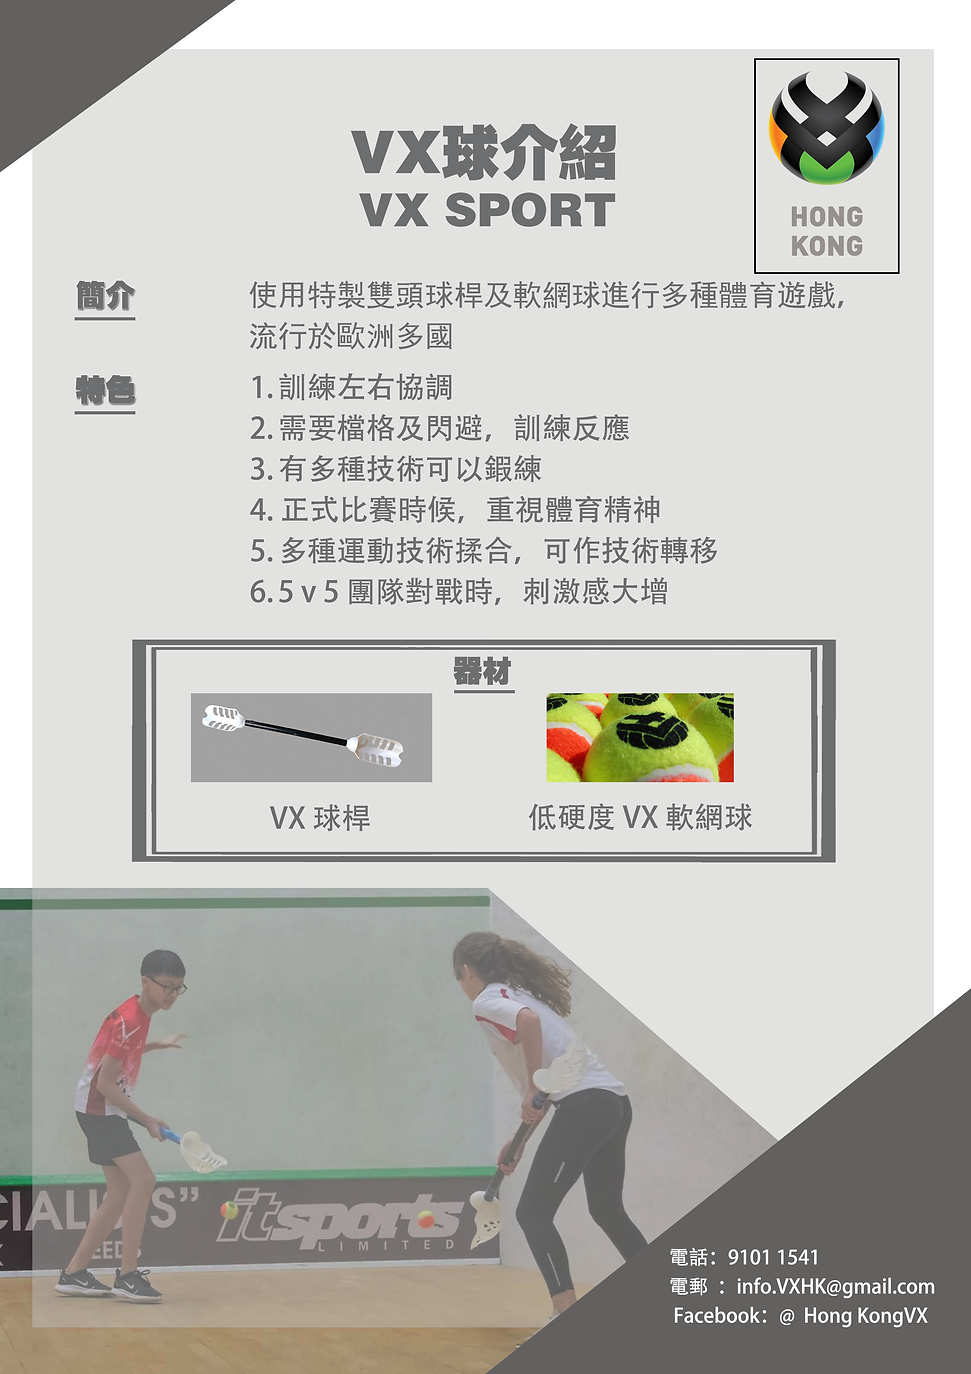 VX球介紹-1.png